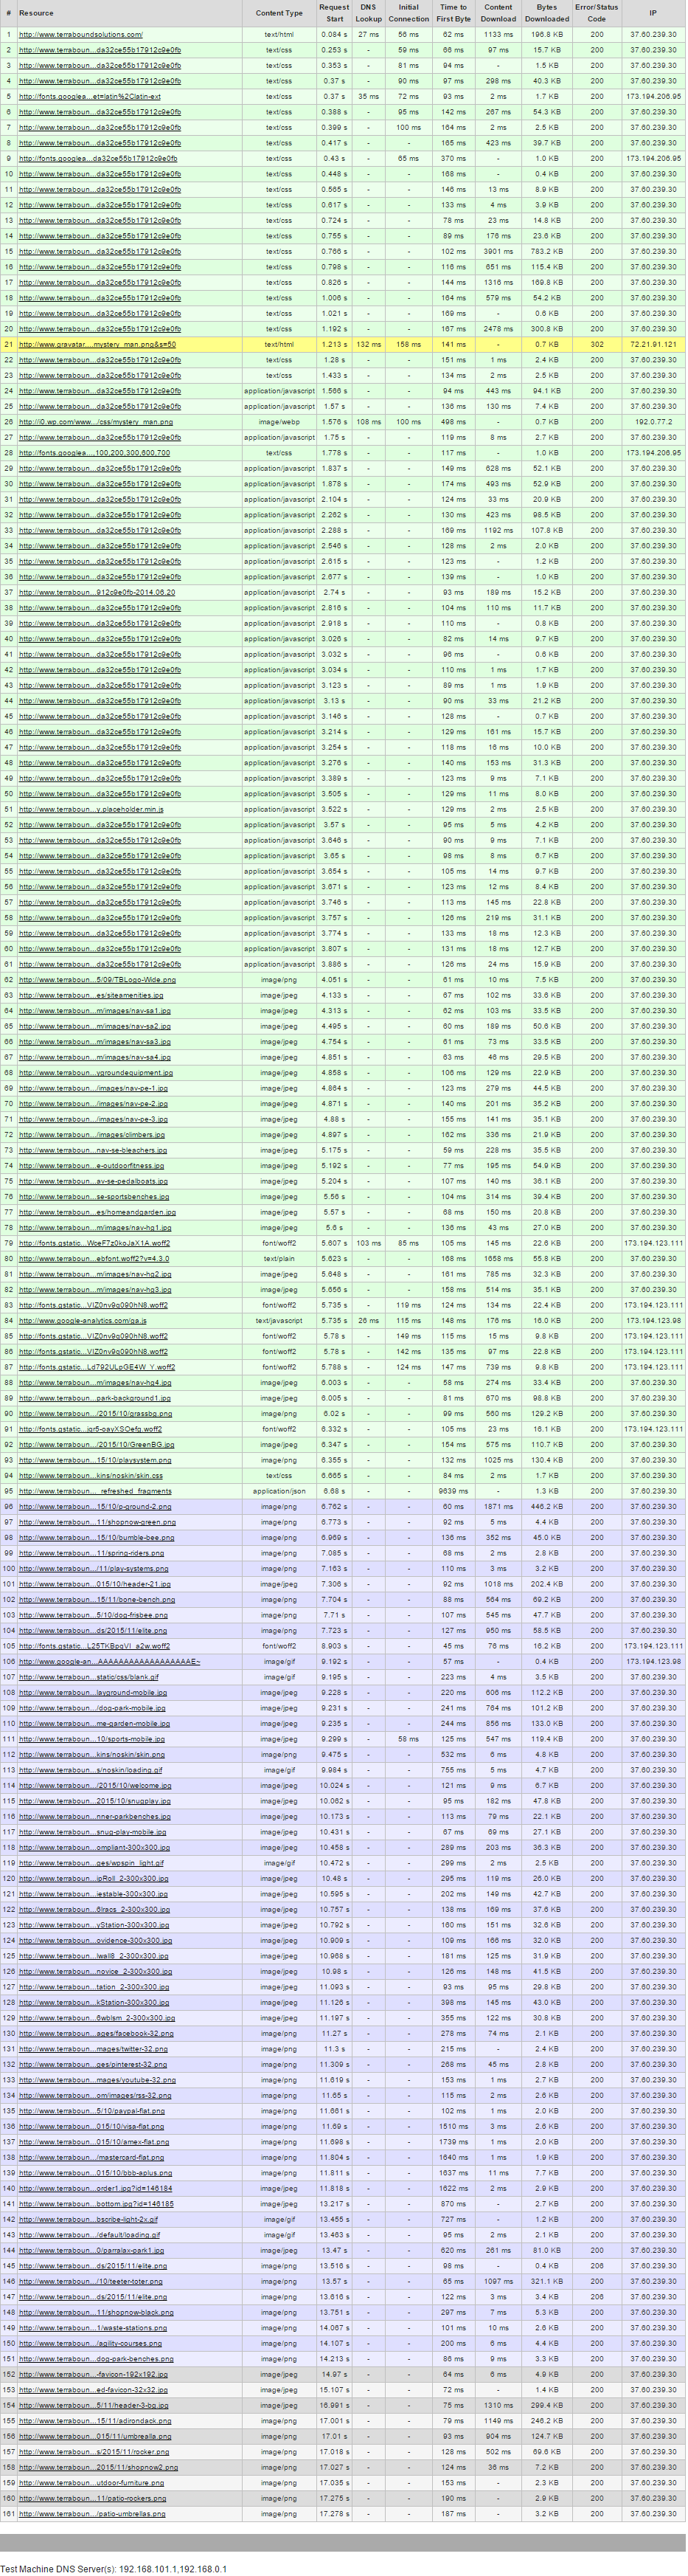 terra request details before